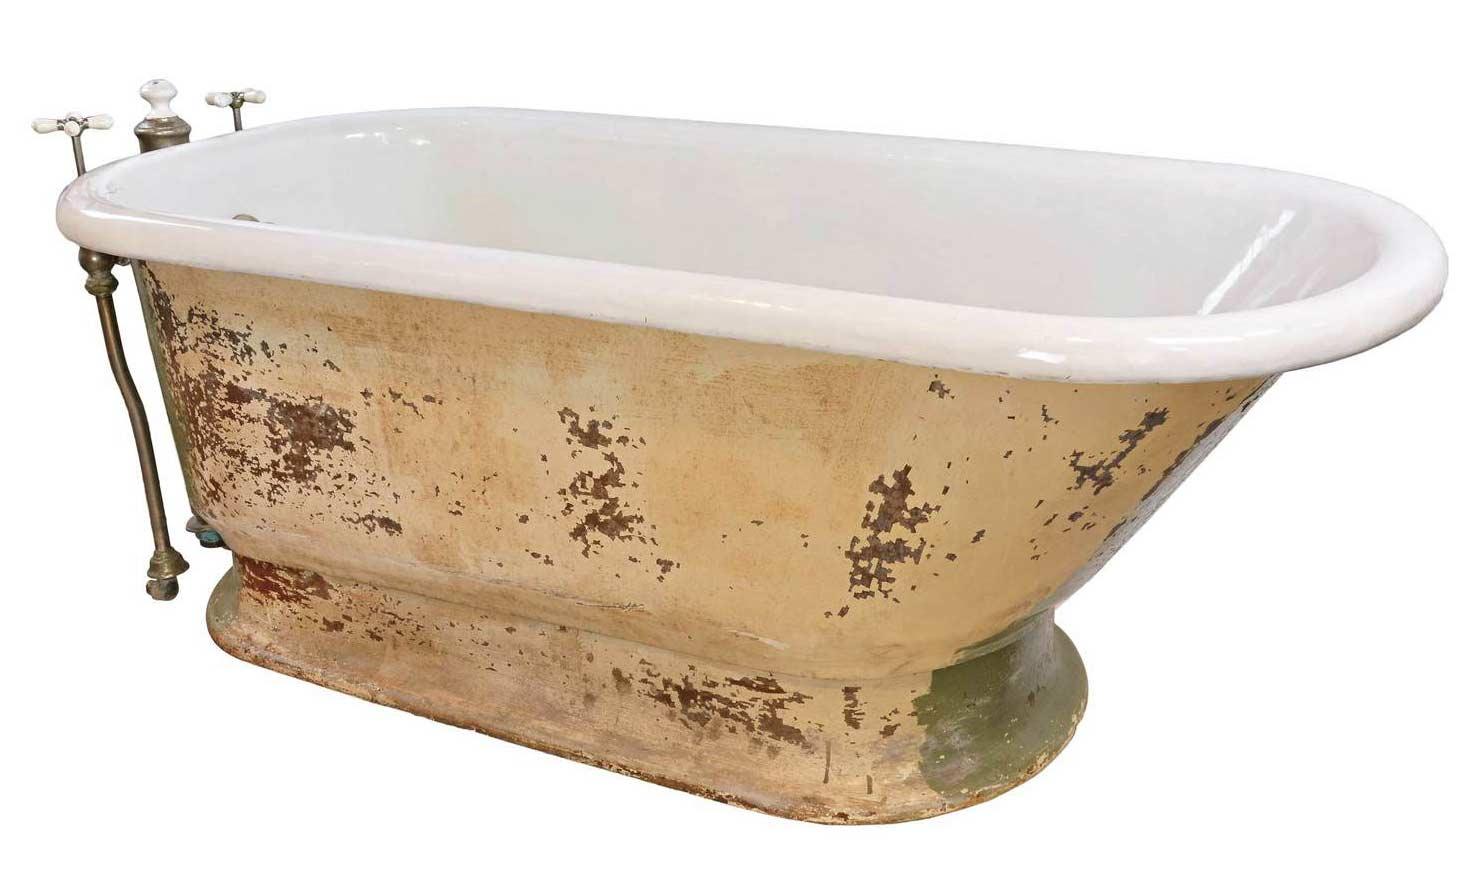 46408-cast-iron-pedestal-tub-with-plumbing-angle.jpg